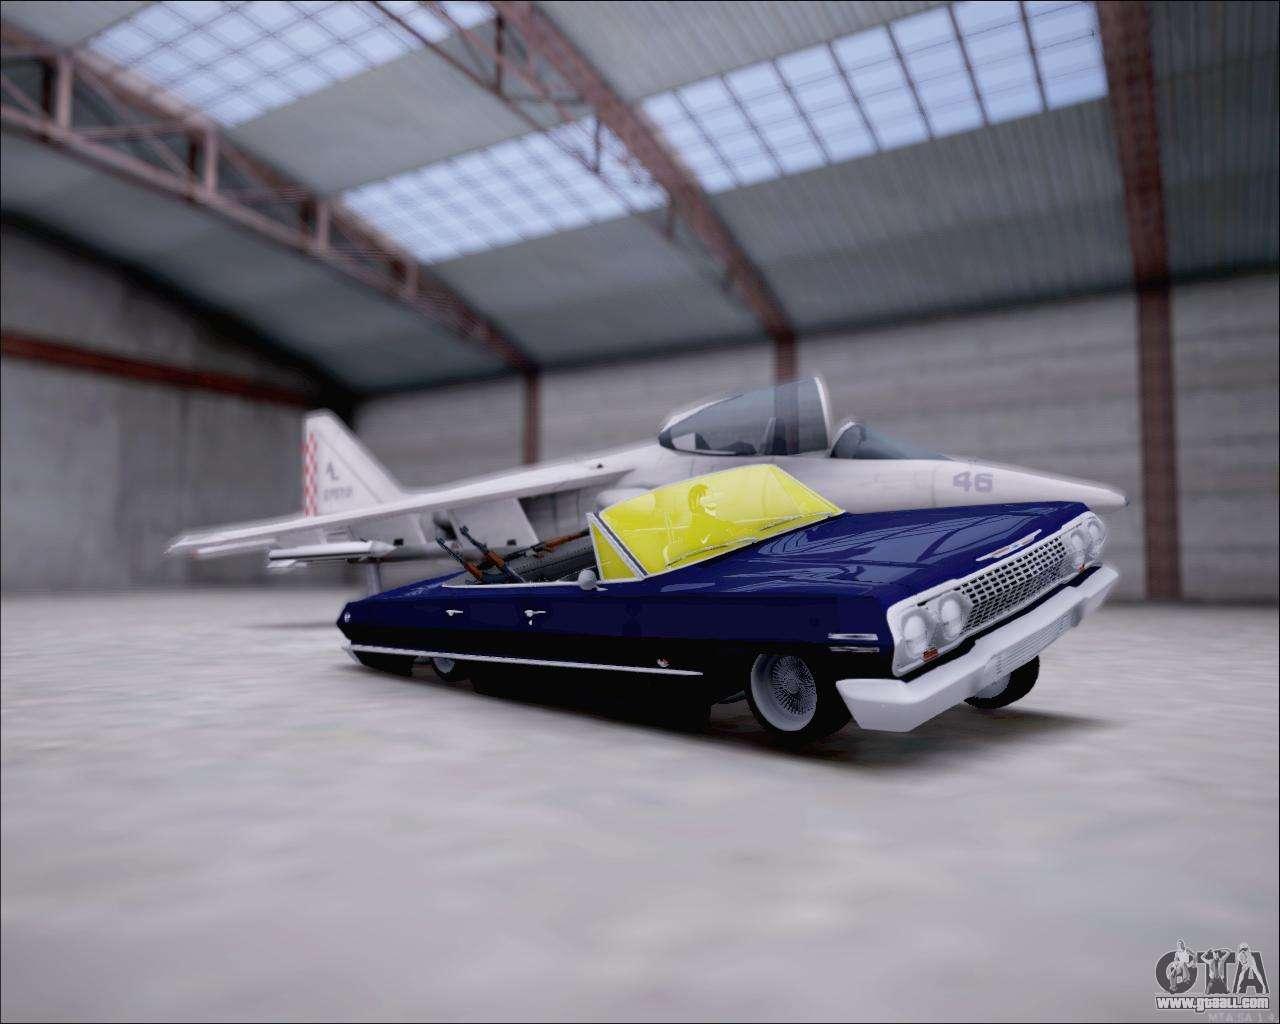 Chevrolet impala 4 door hardtop 1963 for gta san andreas - Chevrolet Impala 1963 For Gta San Andreas